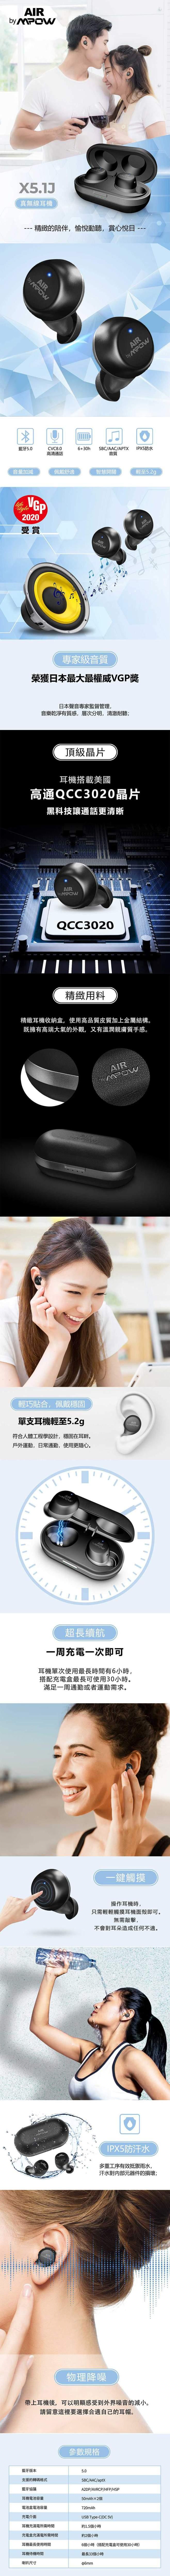 air by MPOW| X5.1J真無線藍牙耳機